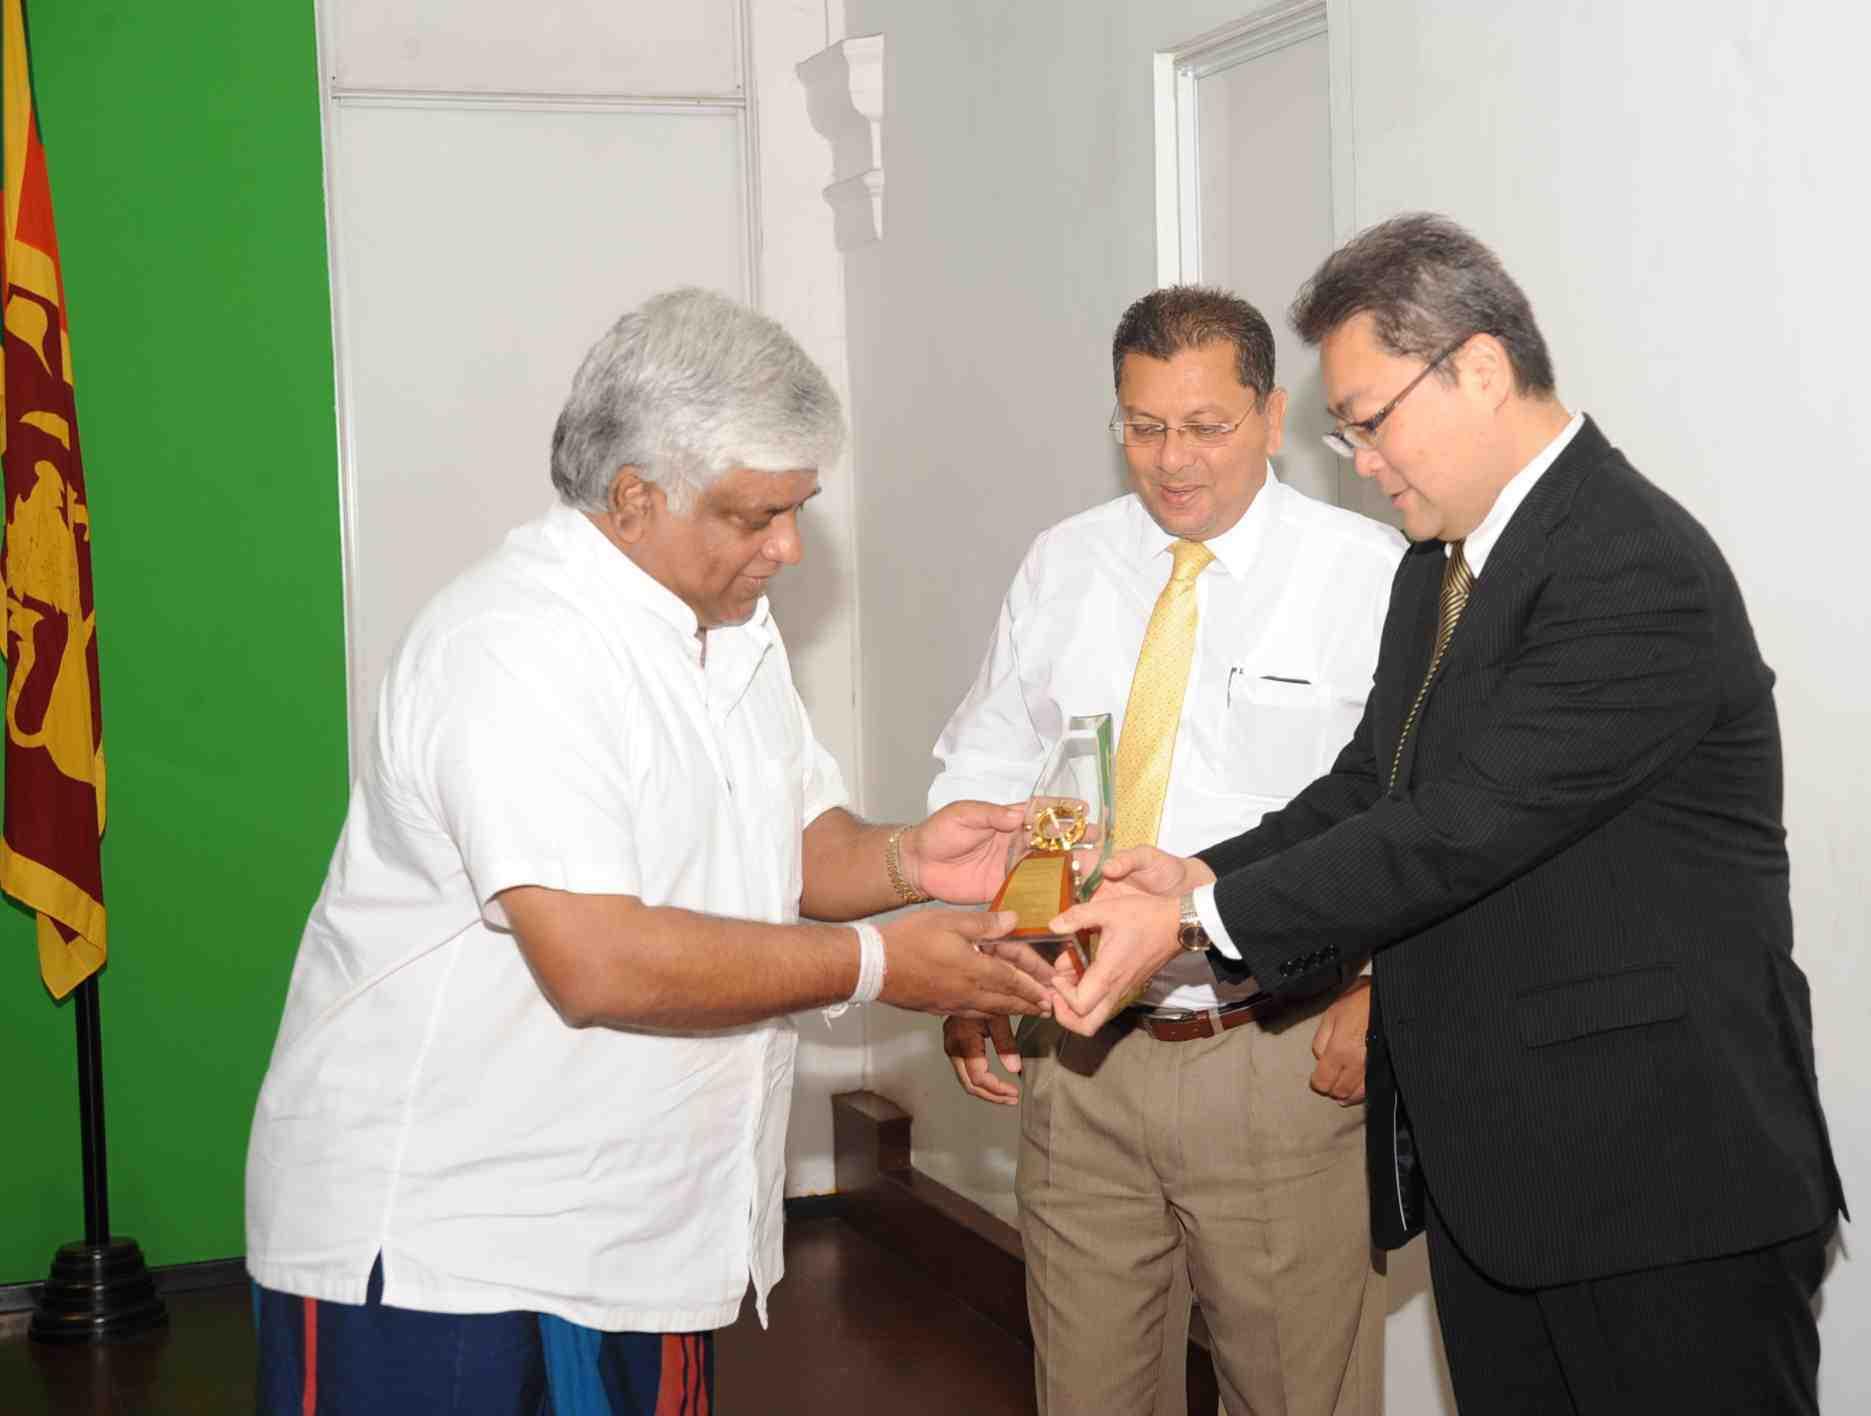 Mv. MARINE RELIANCE calls Hambantota Port